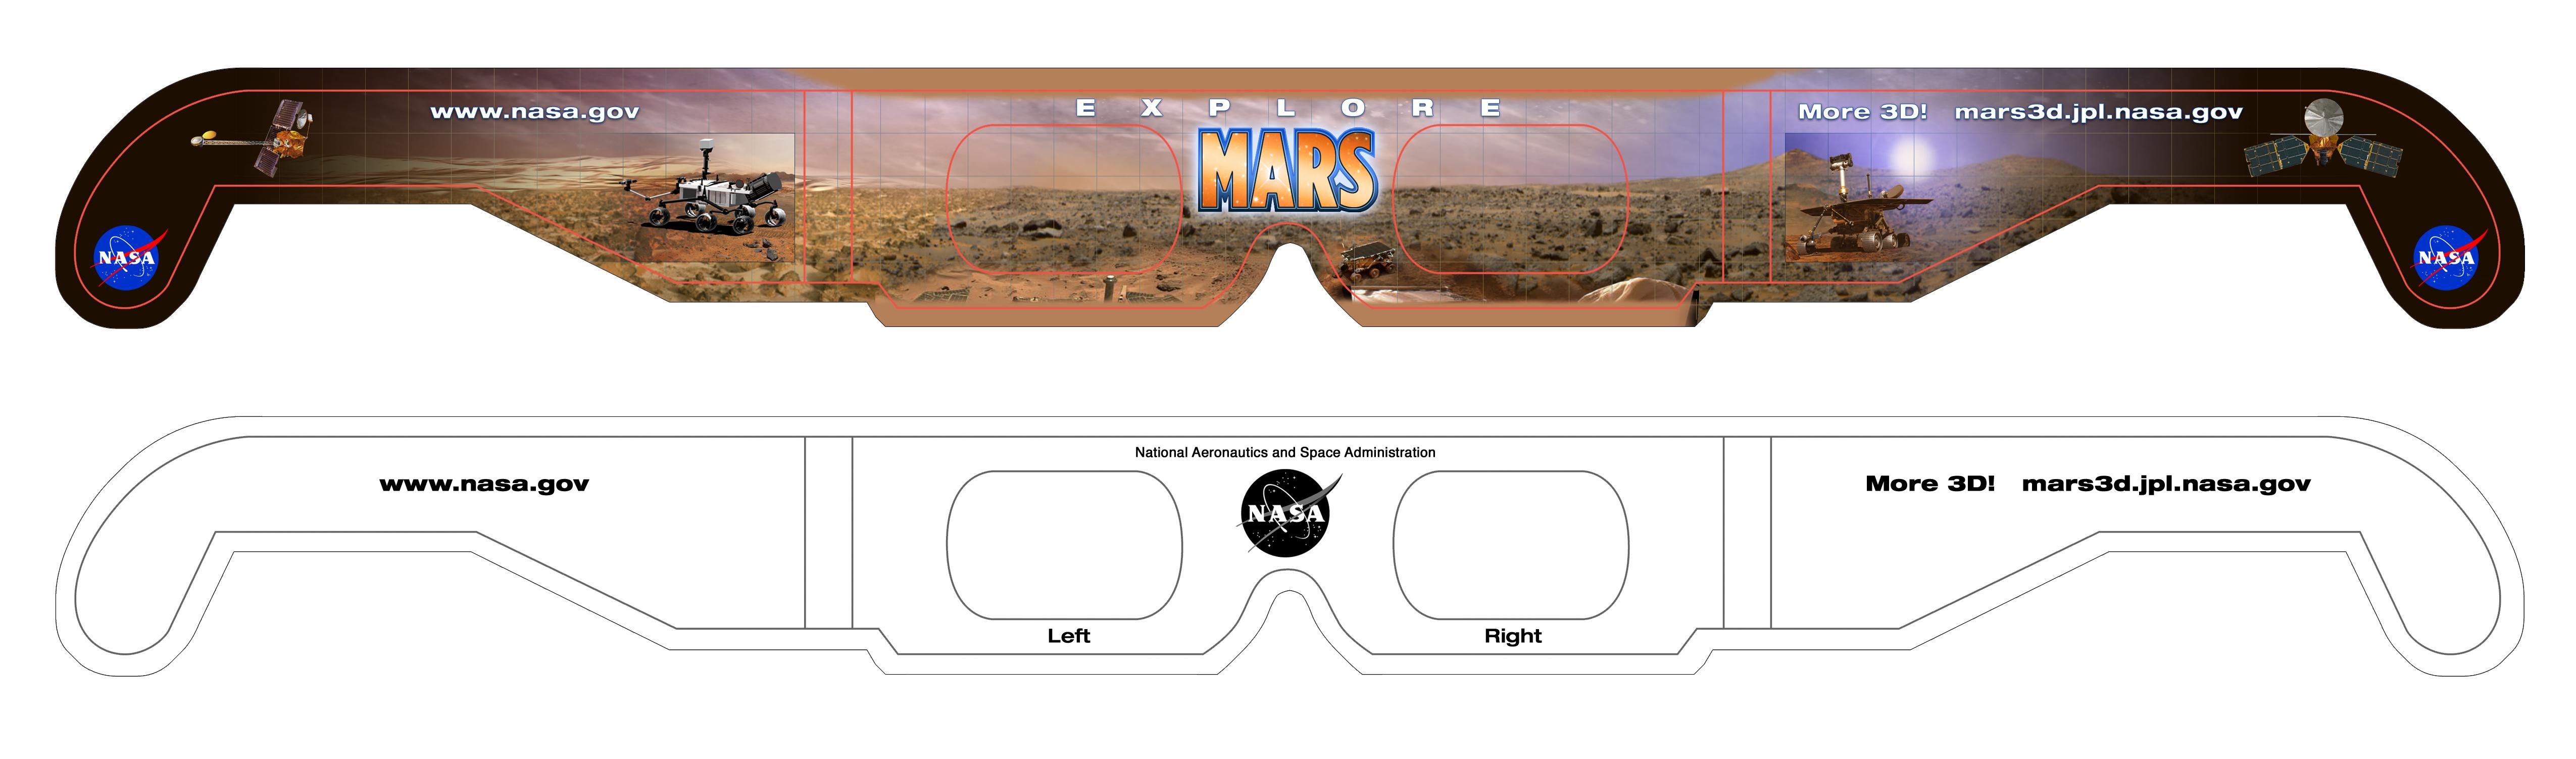 Mars 3D Images - NASA Jet Propulsion Laboratory